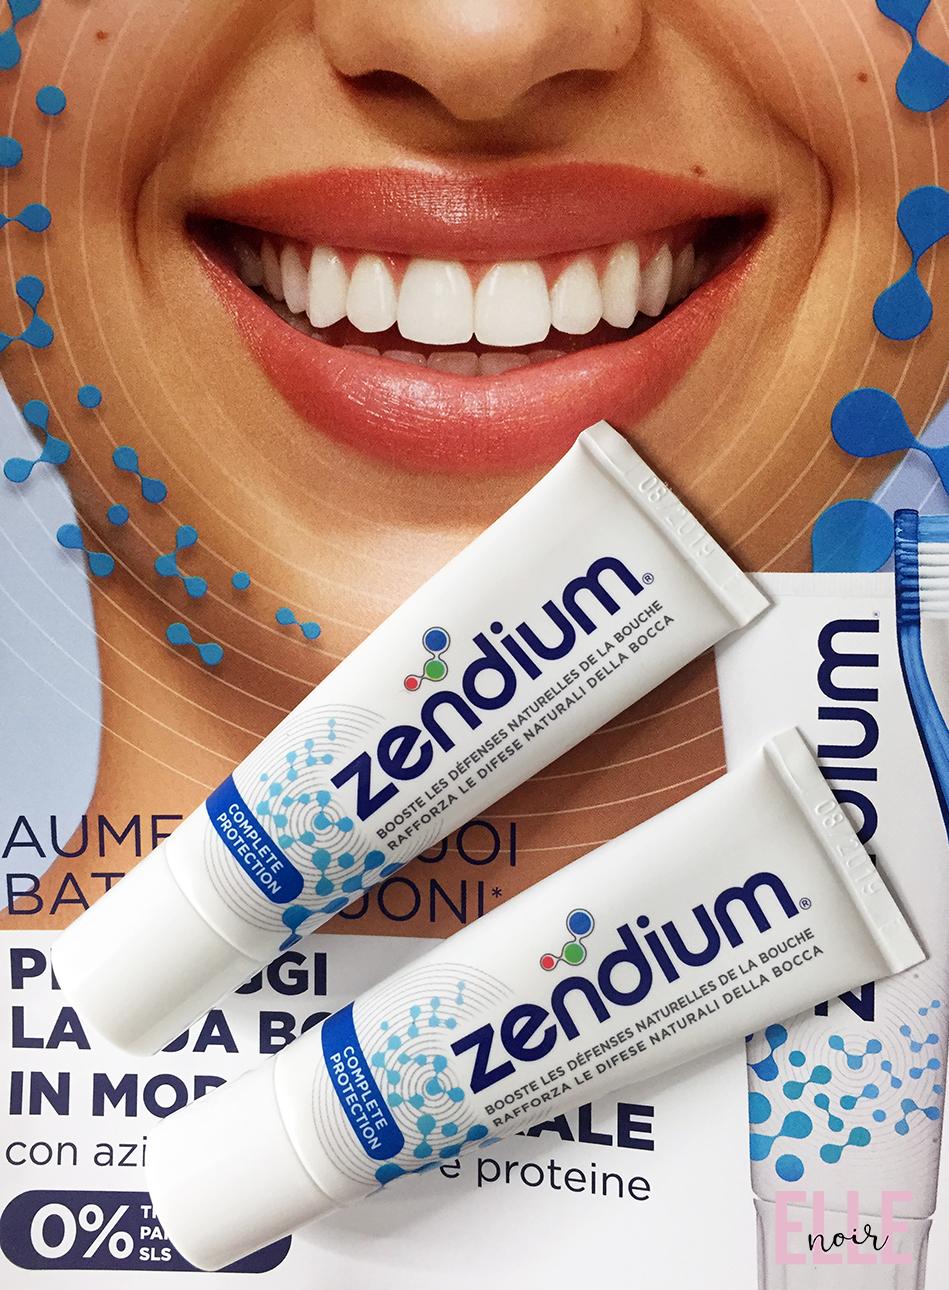 Dentifricio Zendium : due travel size.